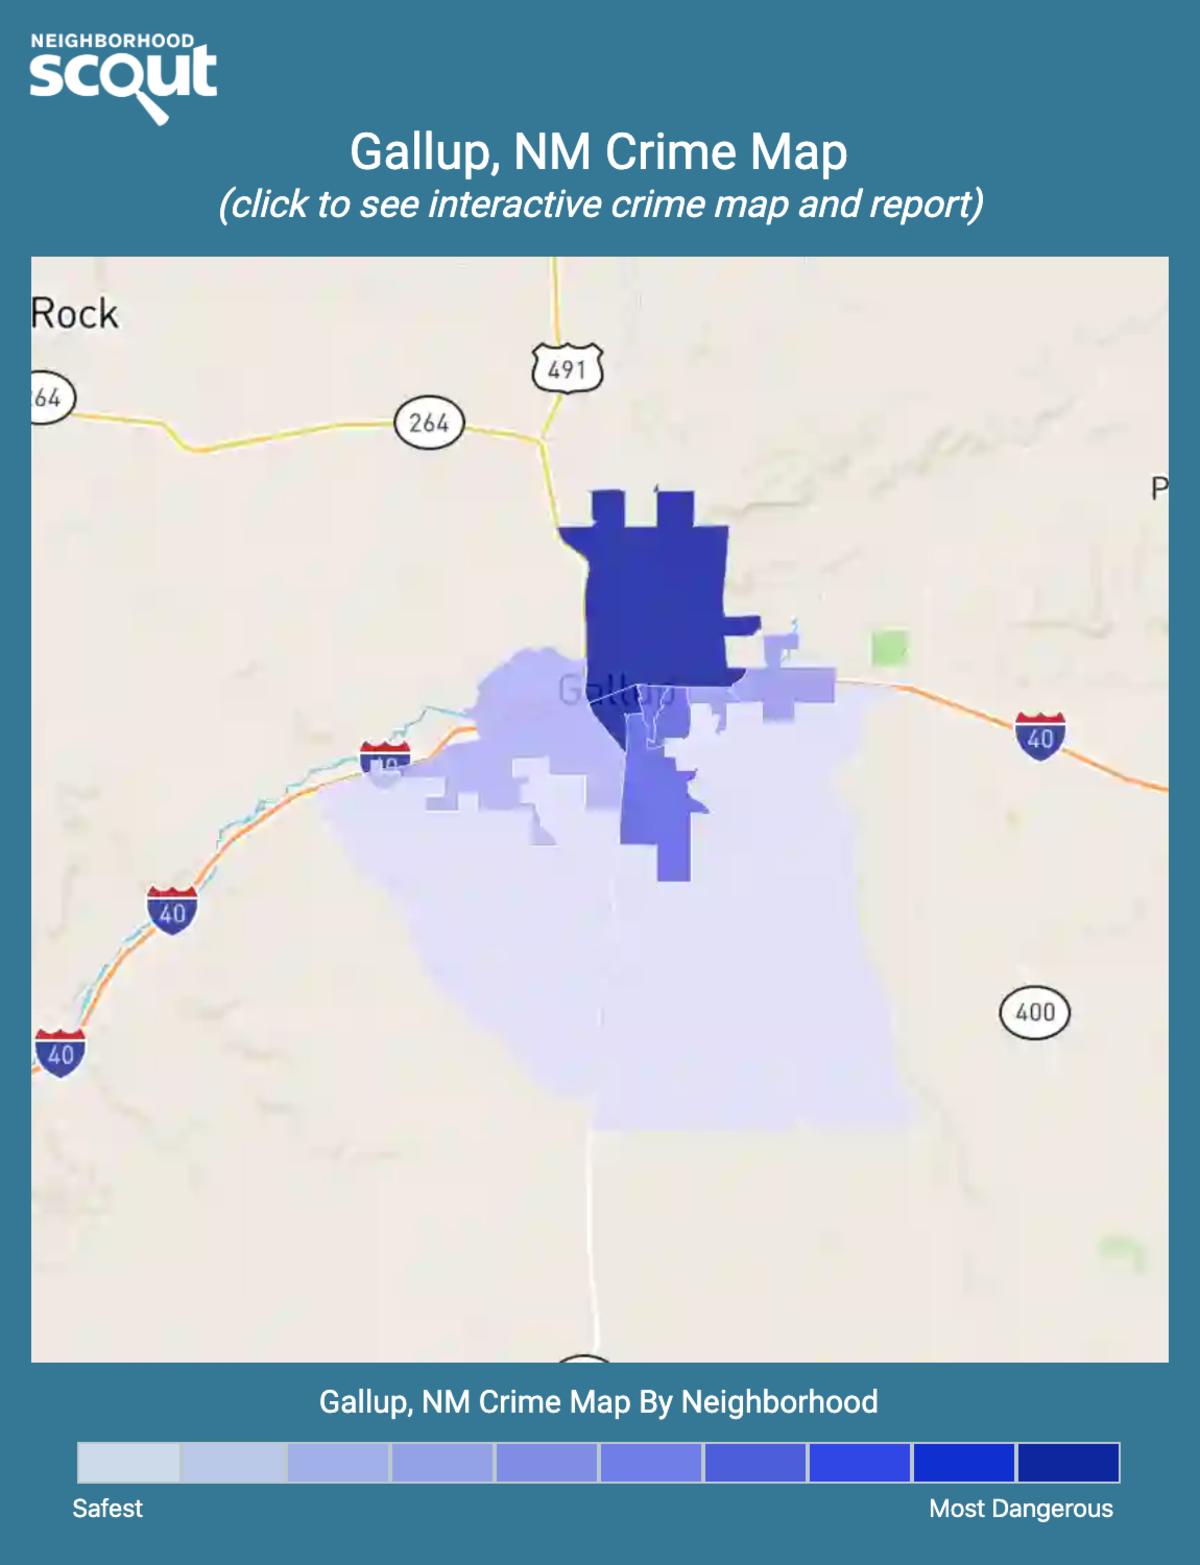 Gallup, New Mexico crime map